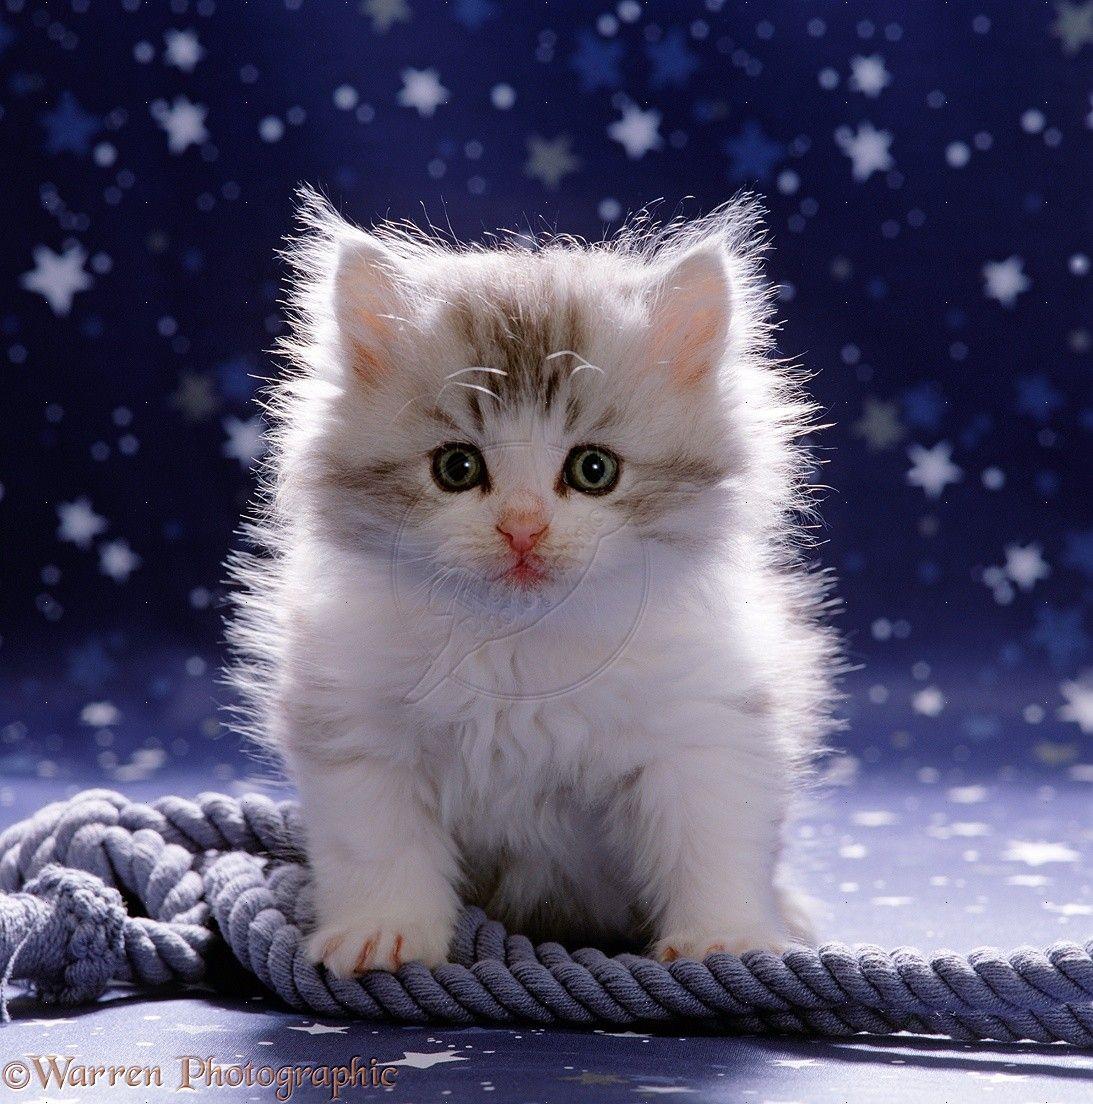 Fluffy Cute Kitten wallpapers Kitten pictures, Kitten